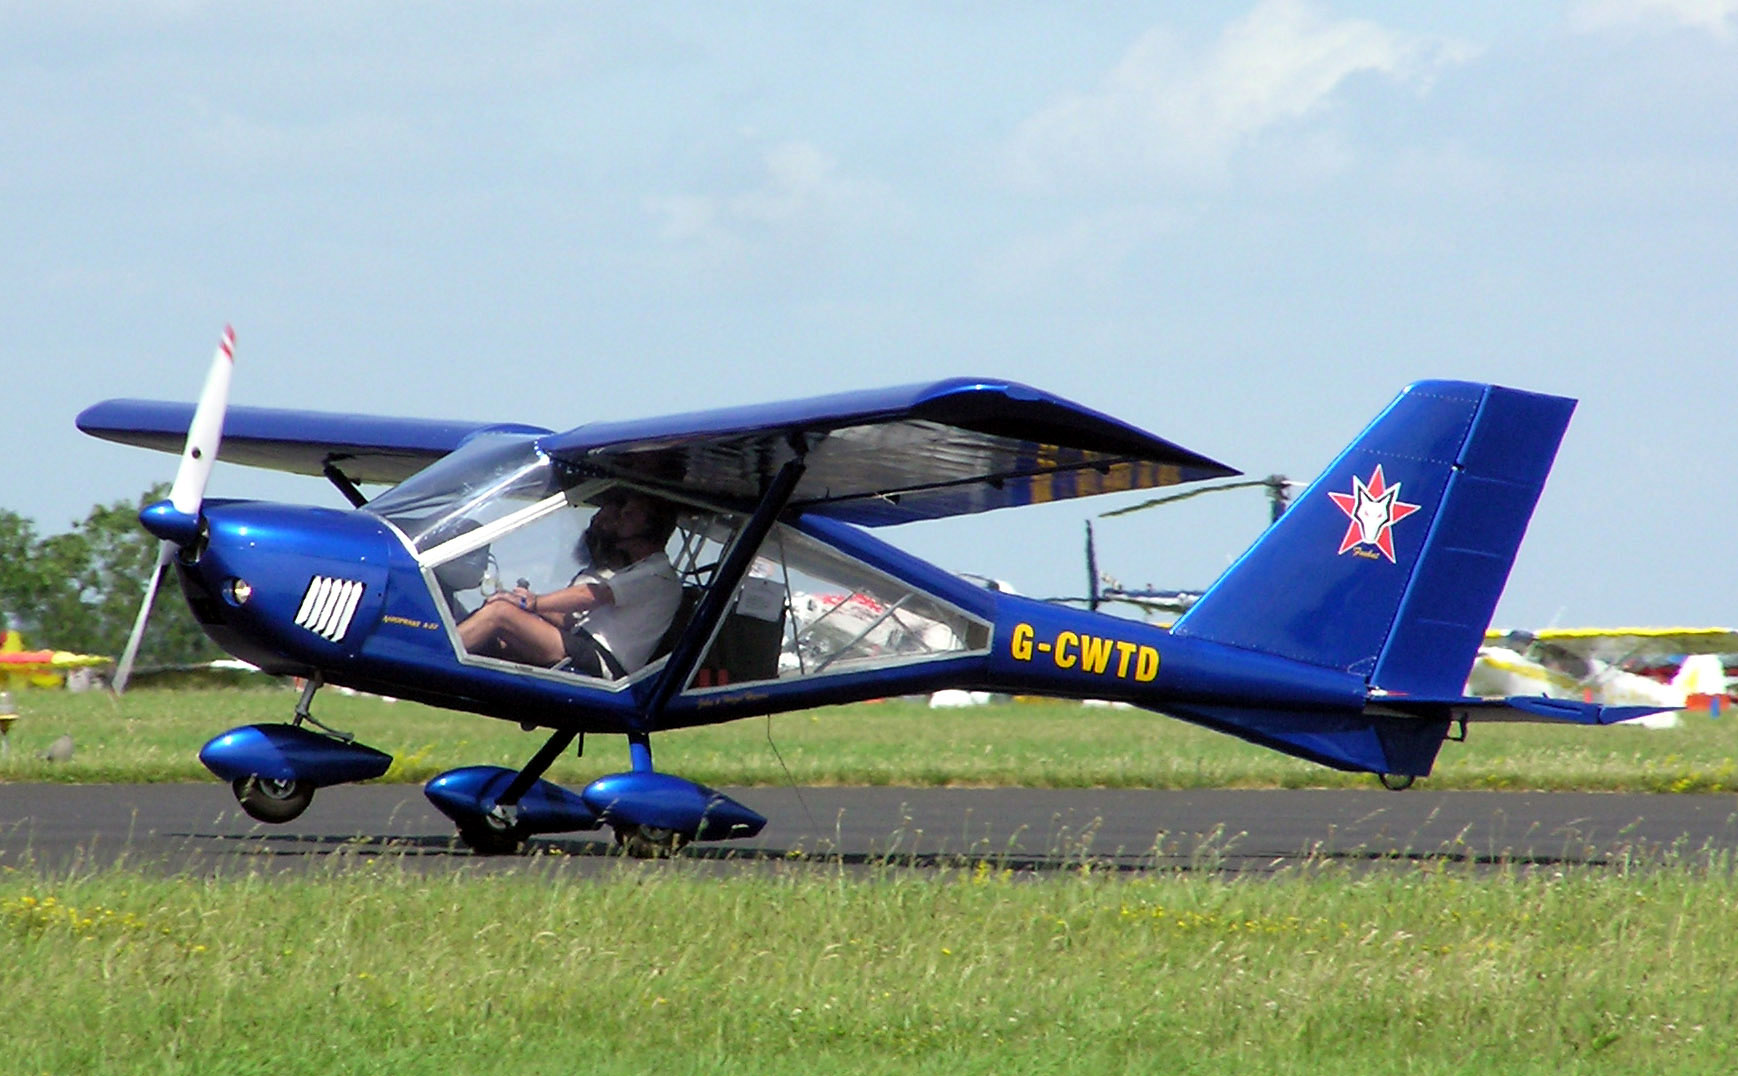 Aeroprakt 22 Чертежи Самолета